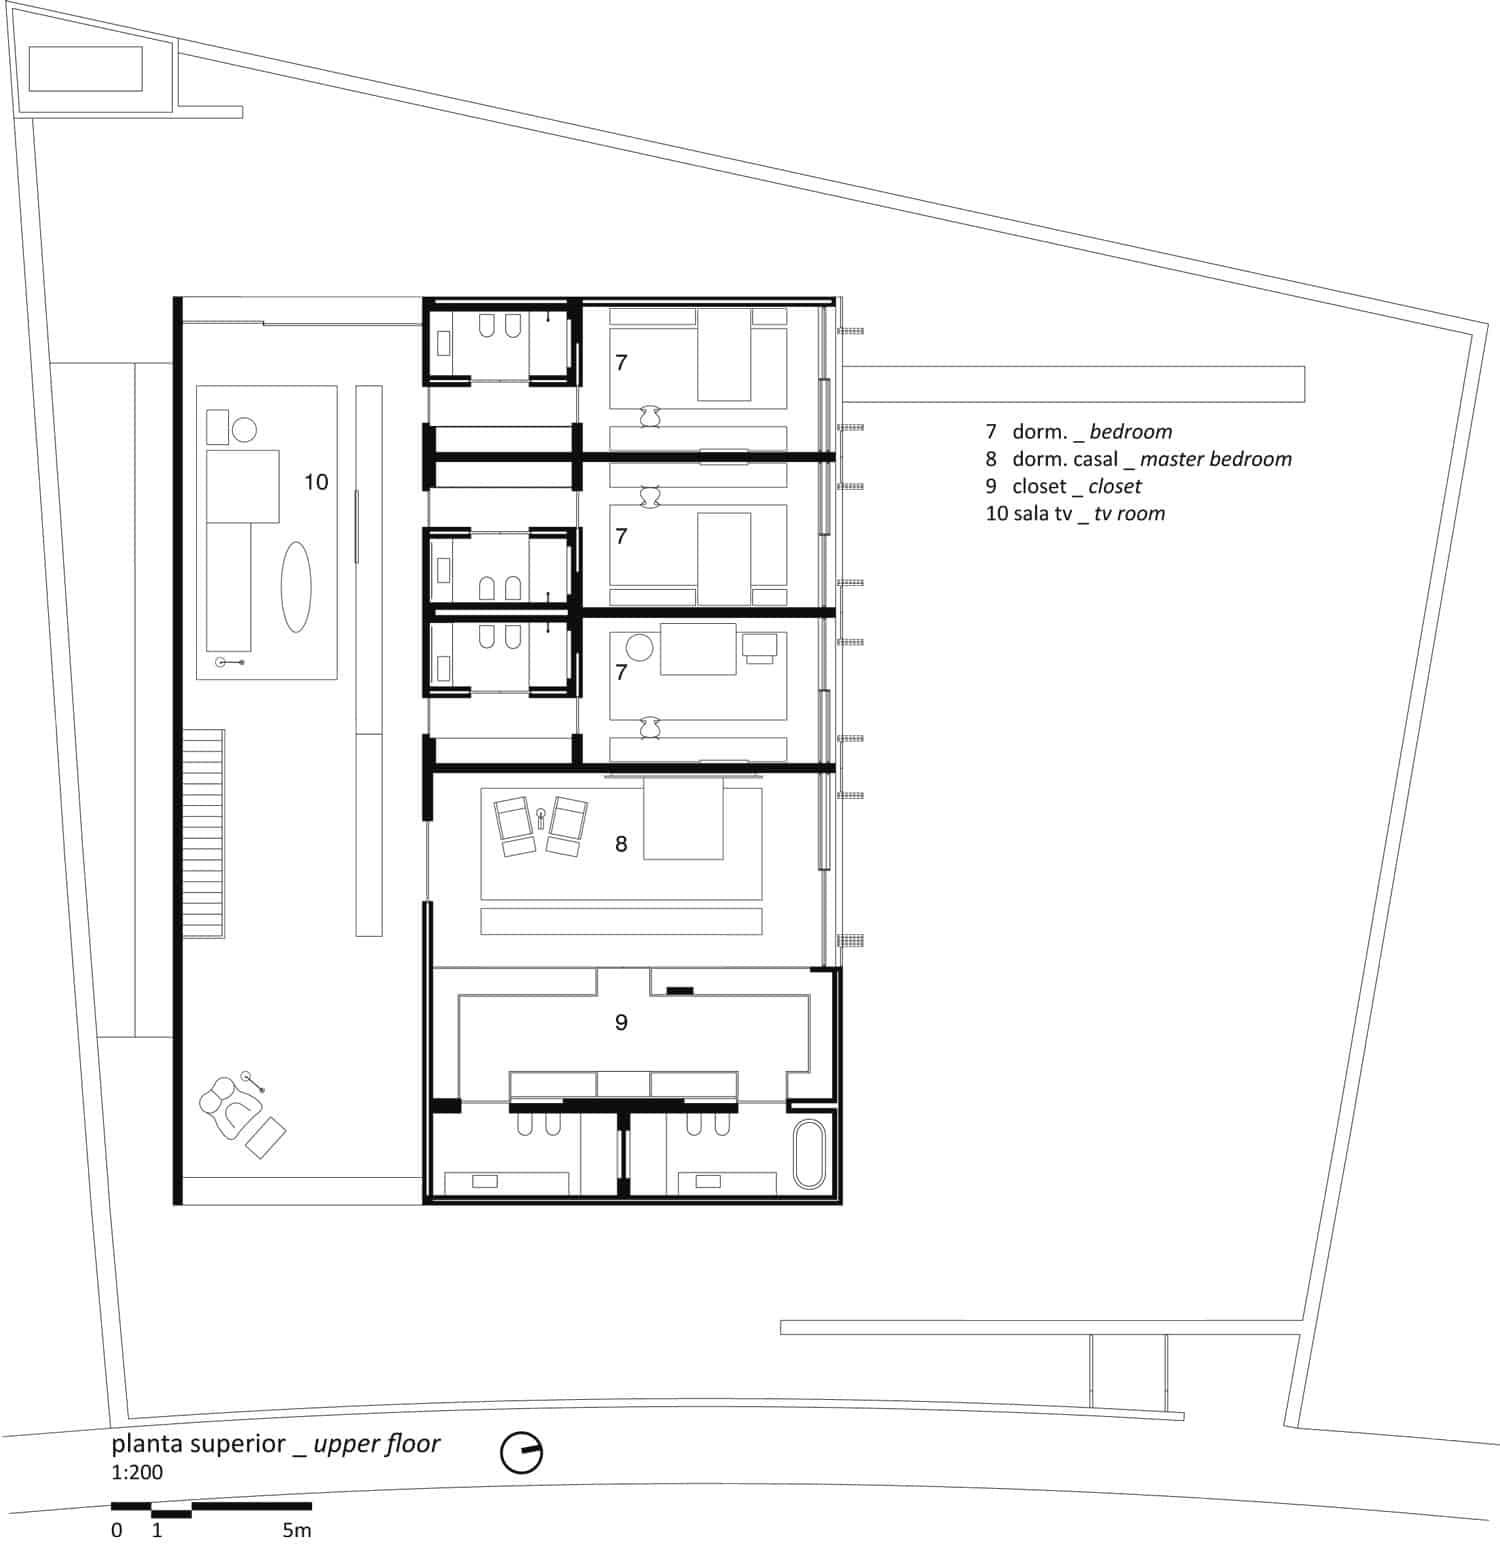 Ipês House by Studio MK27 (28)